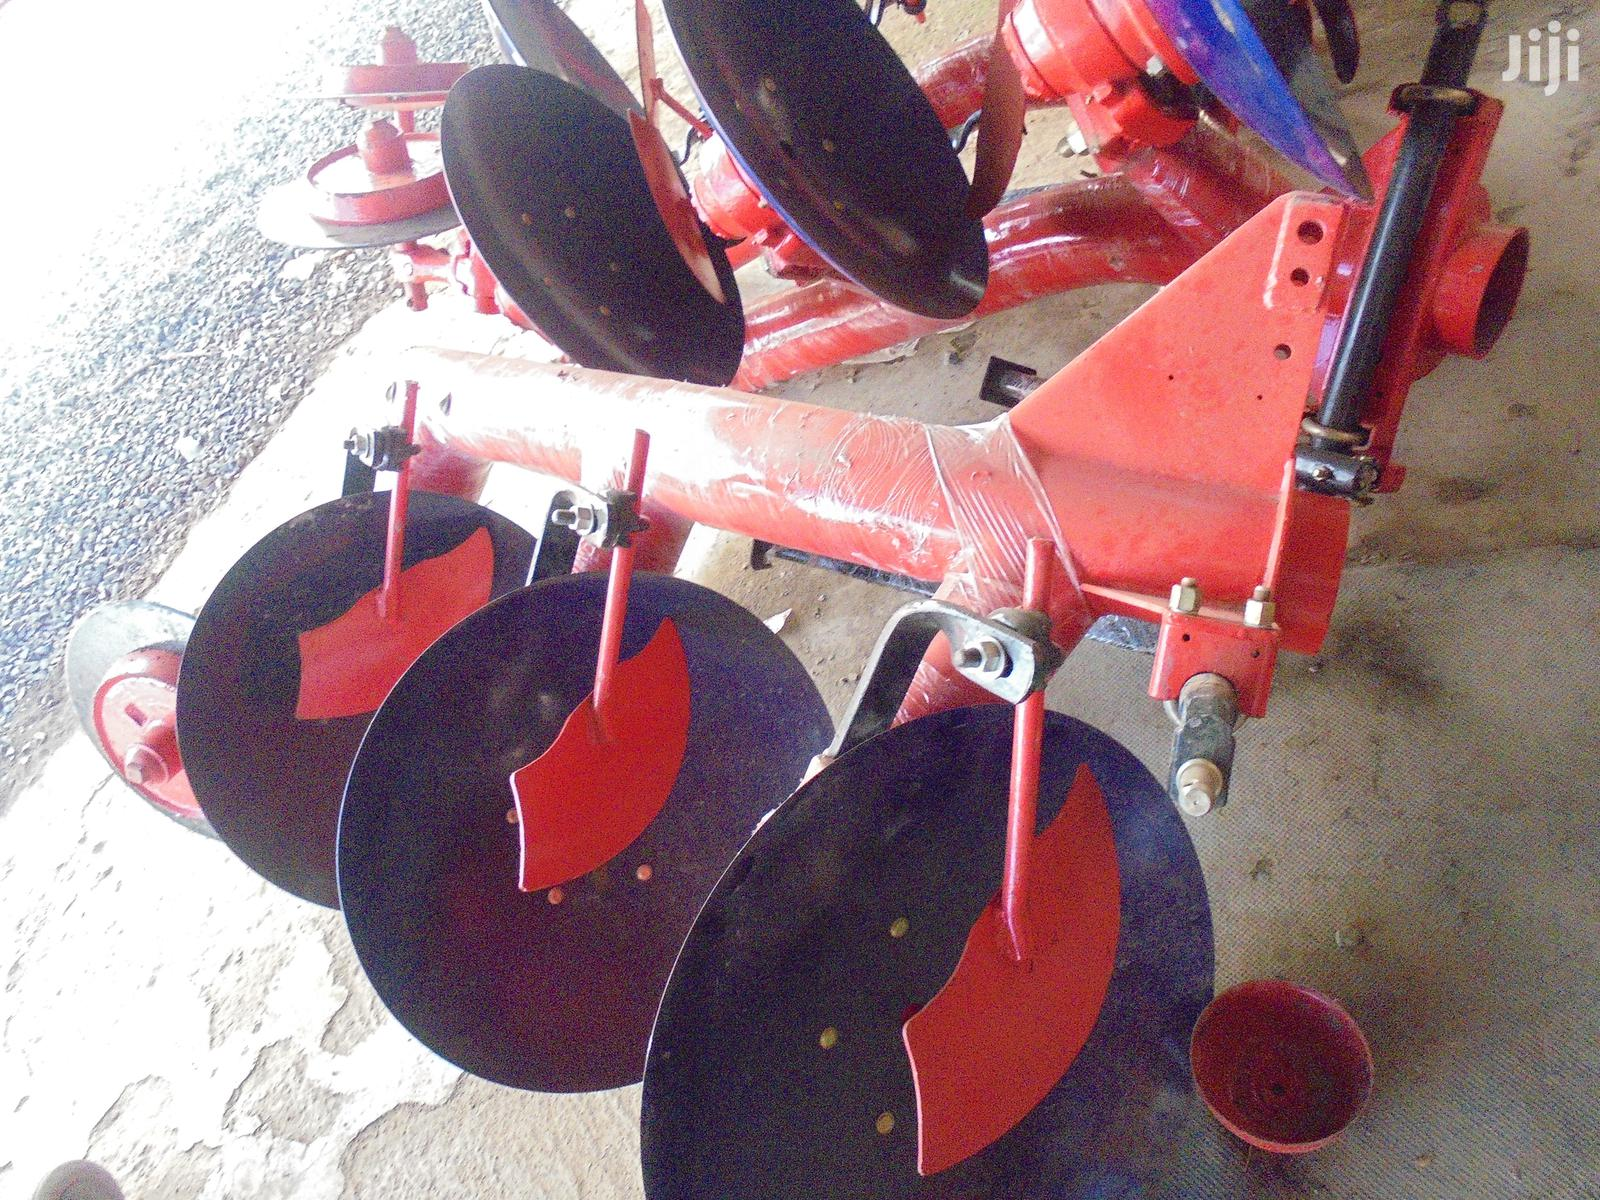 Mf 375 2wd Tractor 2020 Model | Heavy Equipment for sale in Woodley/Kenyatta Golf Course, Nairobi, Kenya